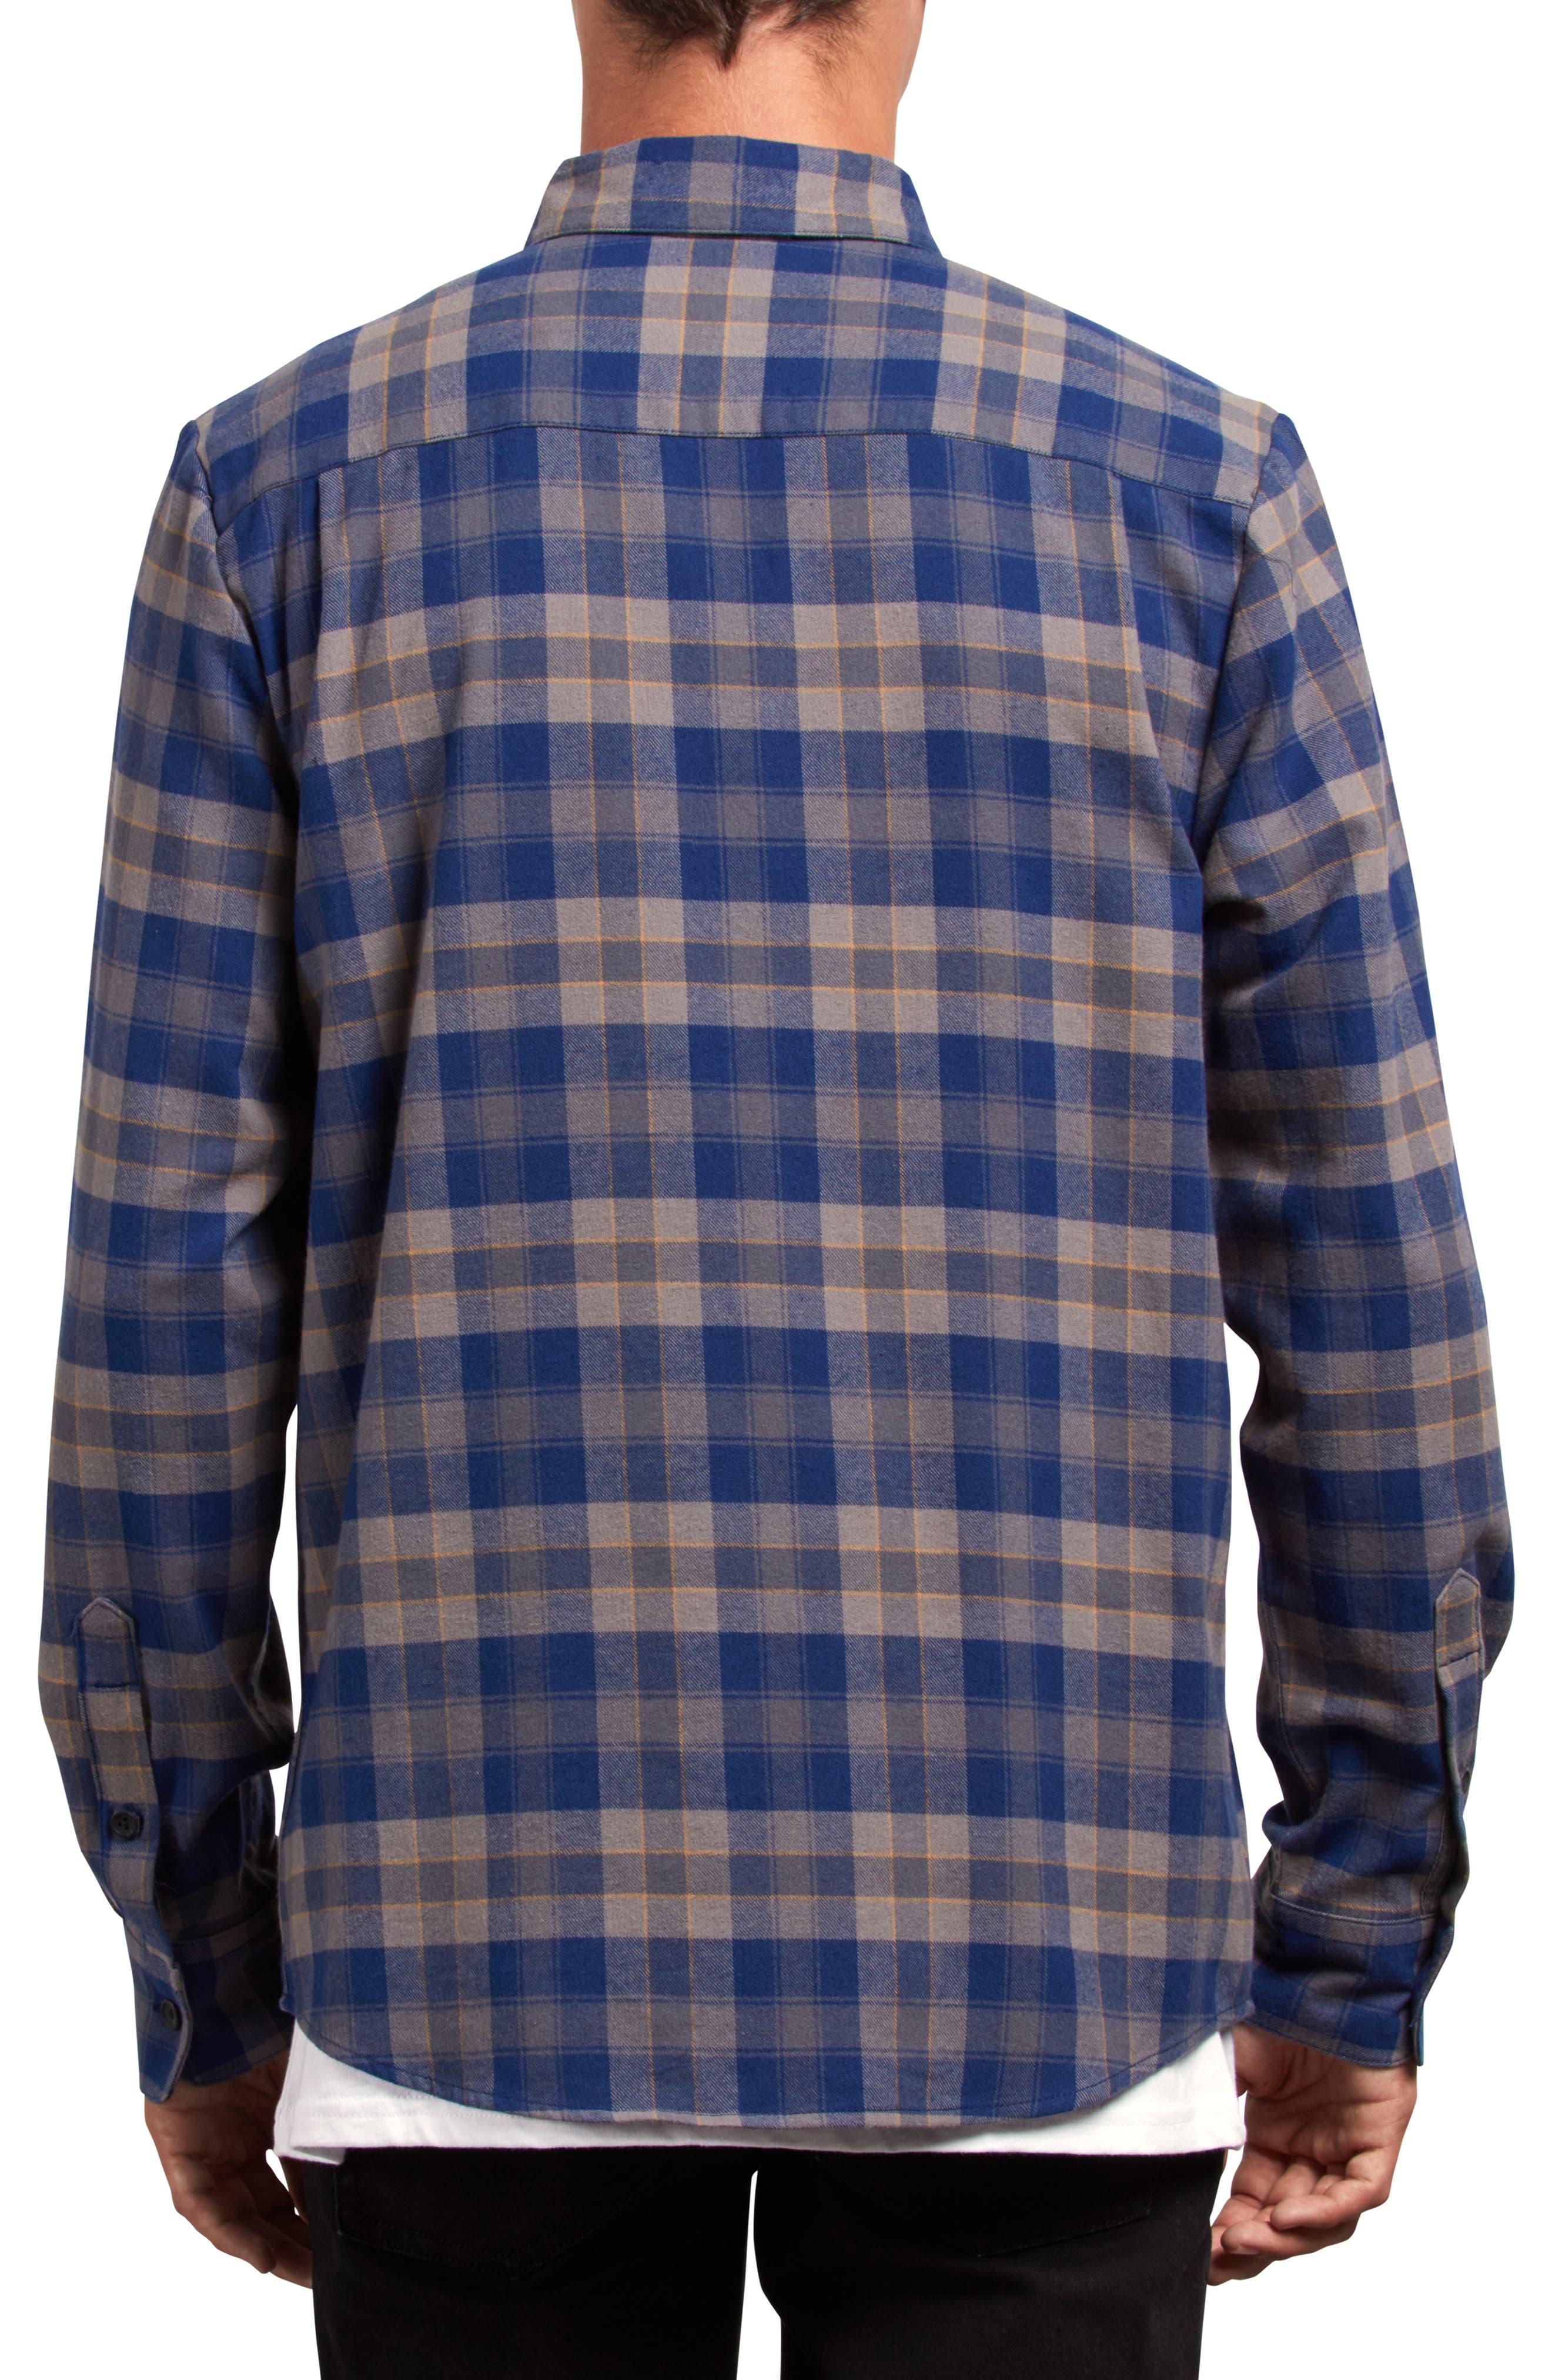 Caden Plaid Flannel Shirt,                             Alternate thumbnail 2, color,                             MEDIUM BLUE